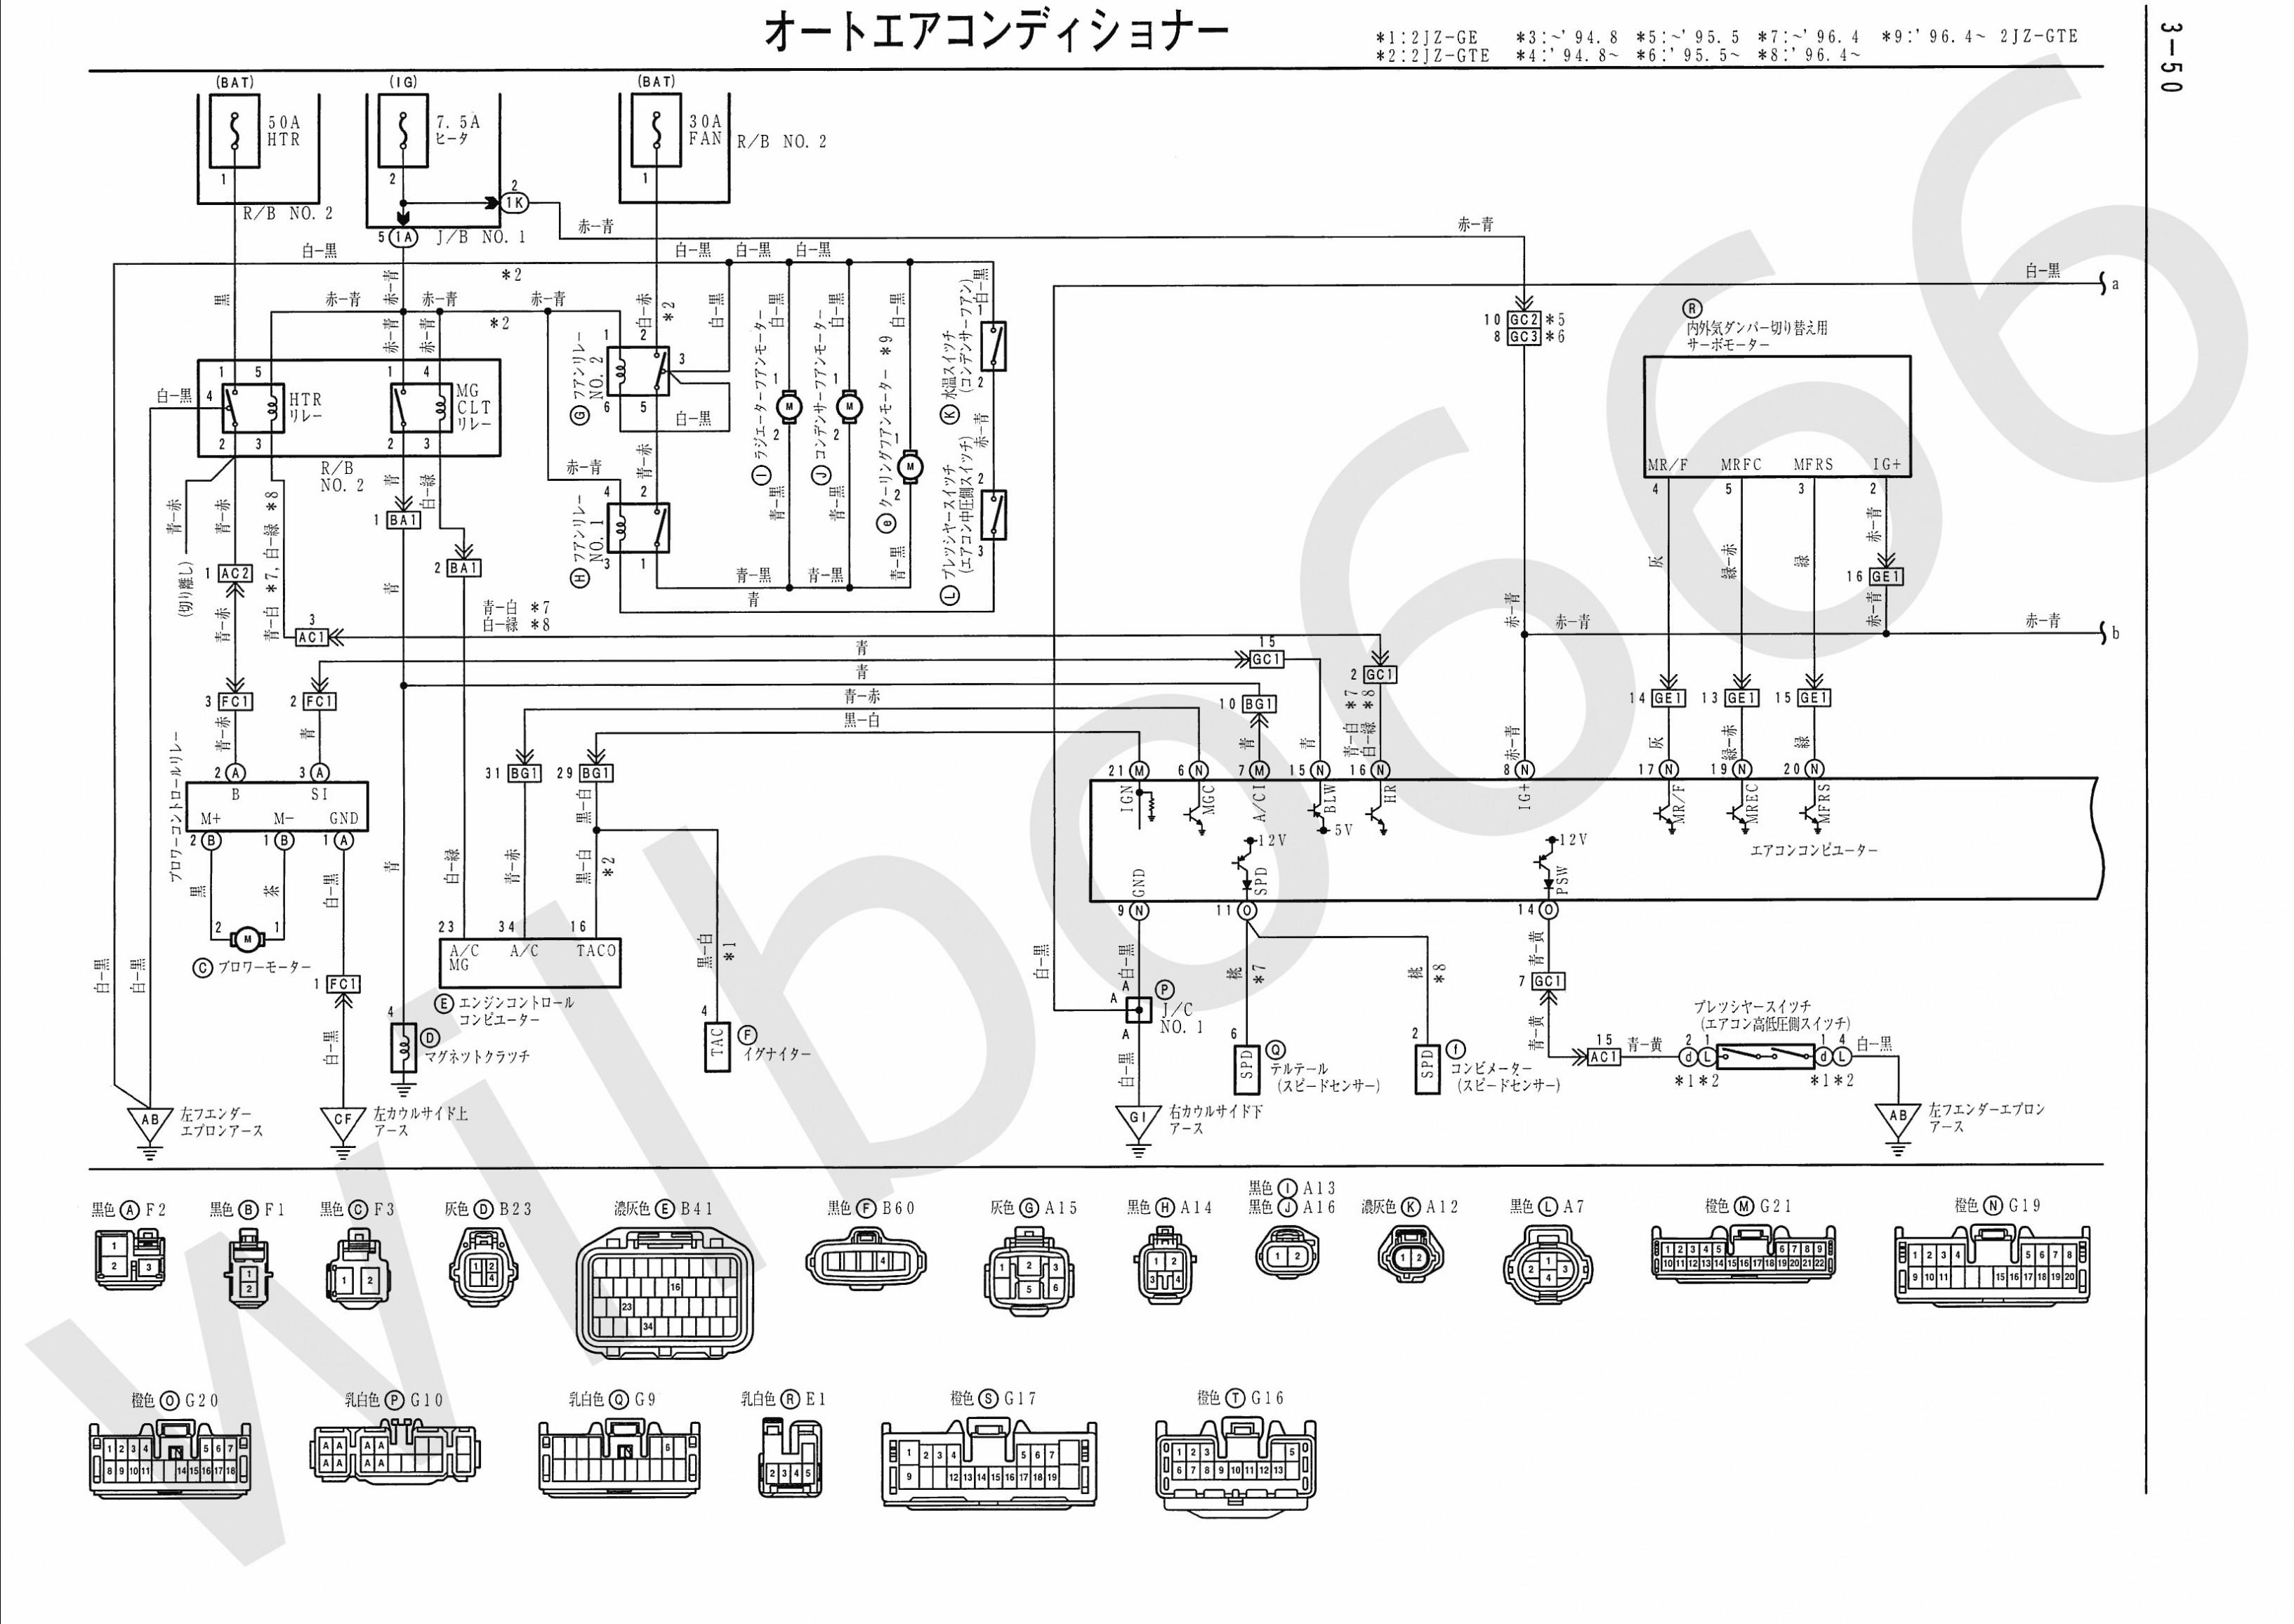 1998 Honda Civic Lx Engine Diagram 1998 Civic Engine Diagram Layout Wiring Diagrams • Of 1998 Honda Civic Lx Engine Diagram